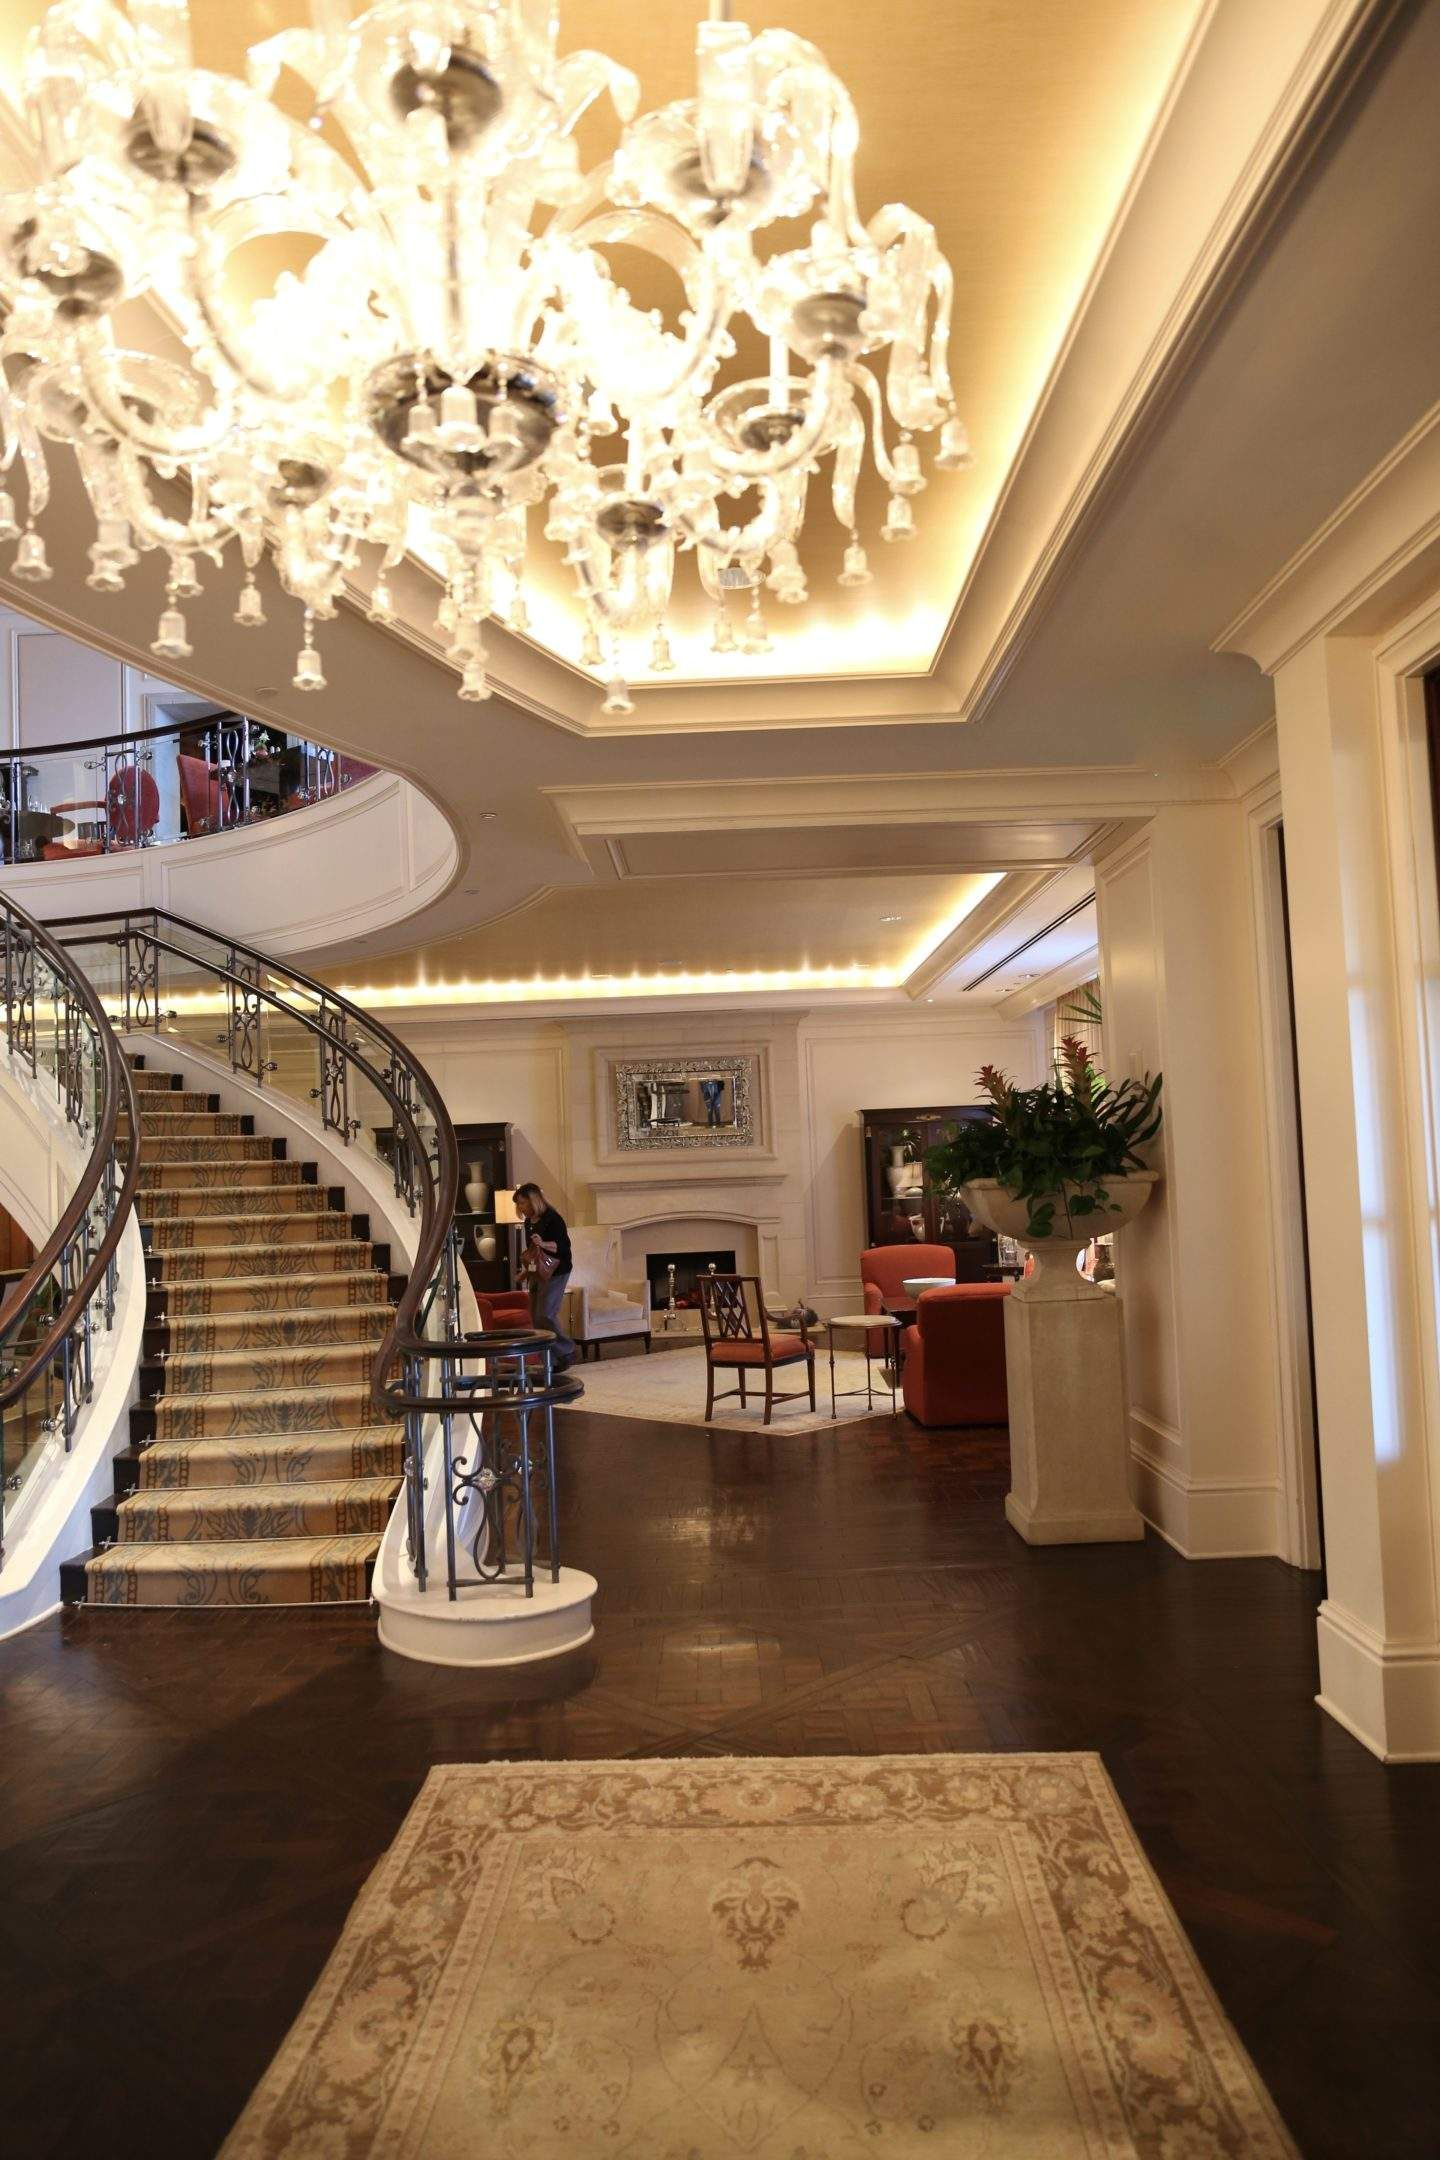 bluegraygal Luxury hotel, Hotel, Five star hotel